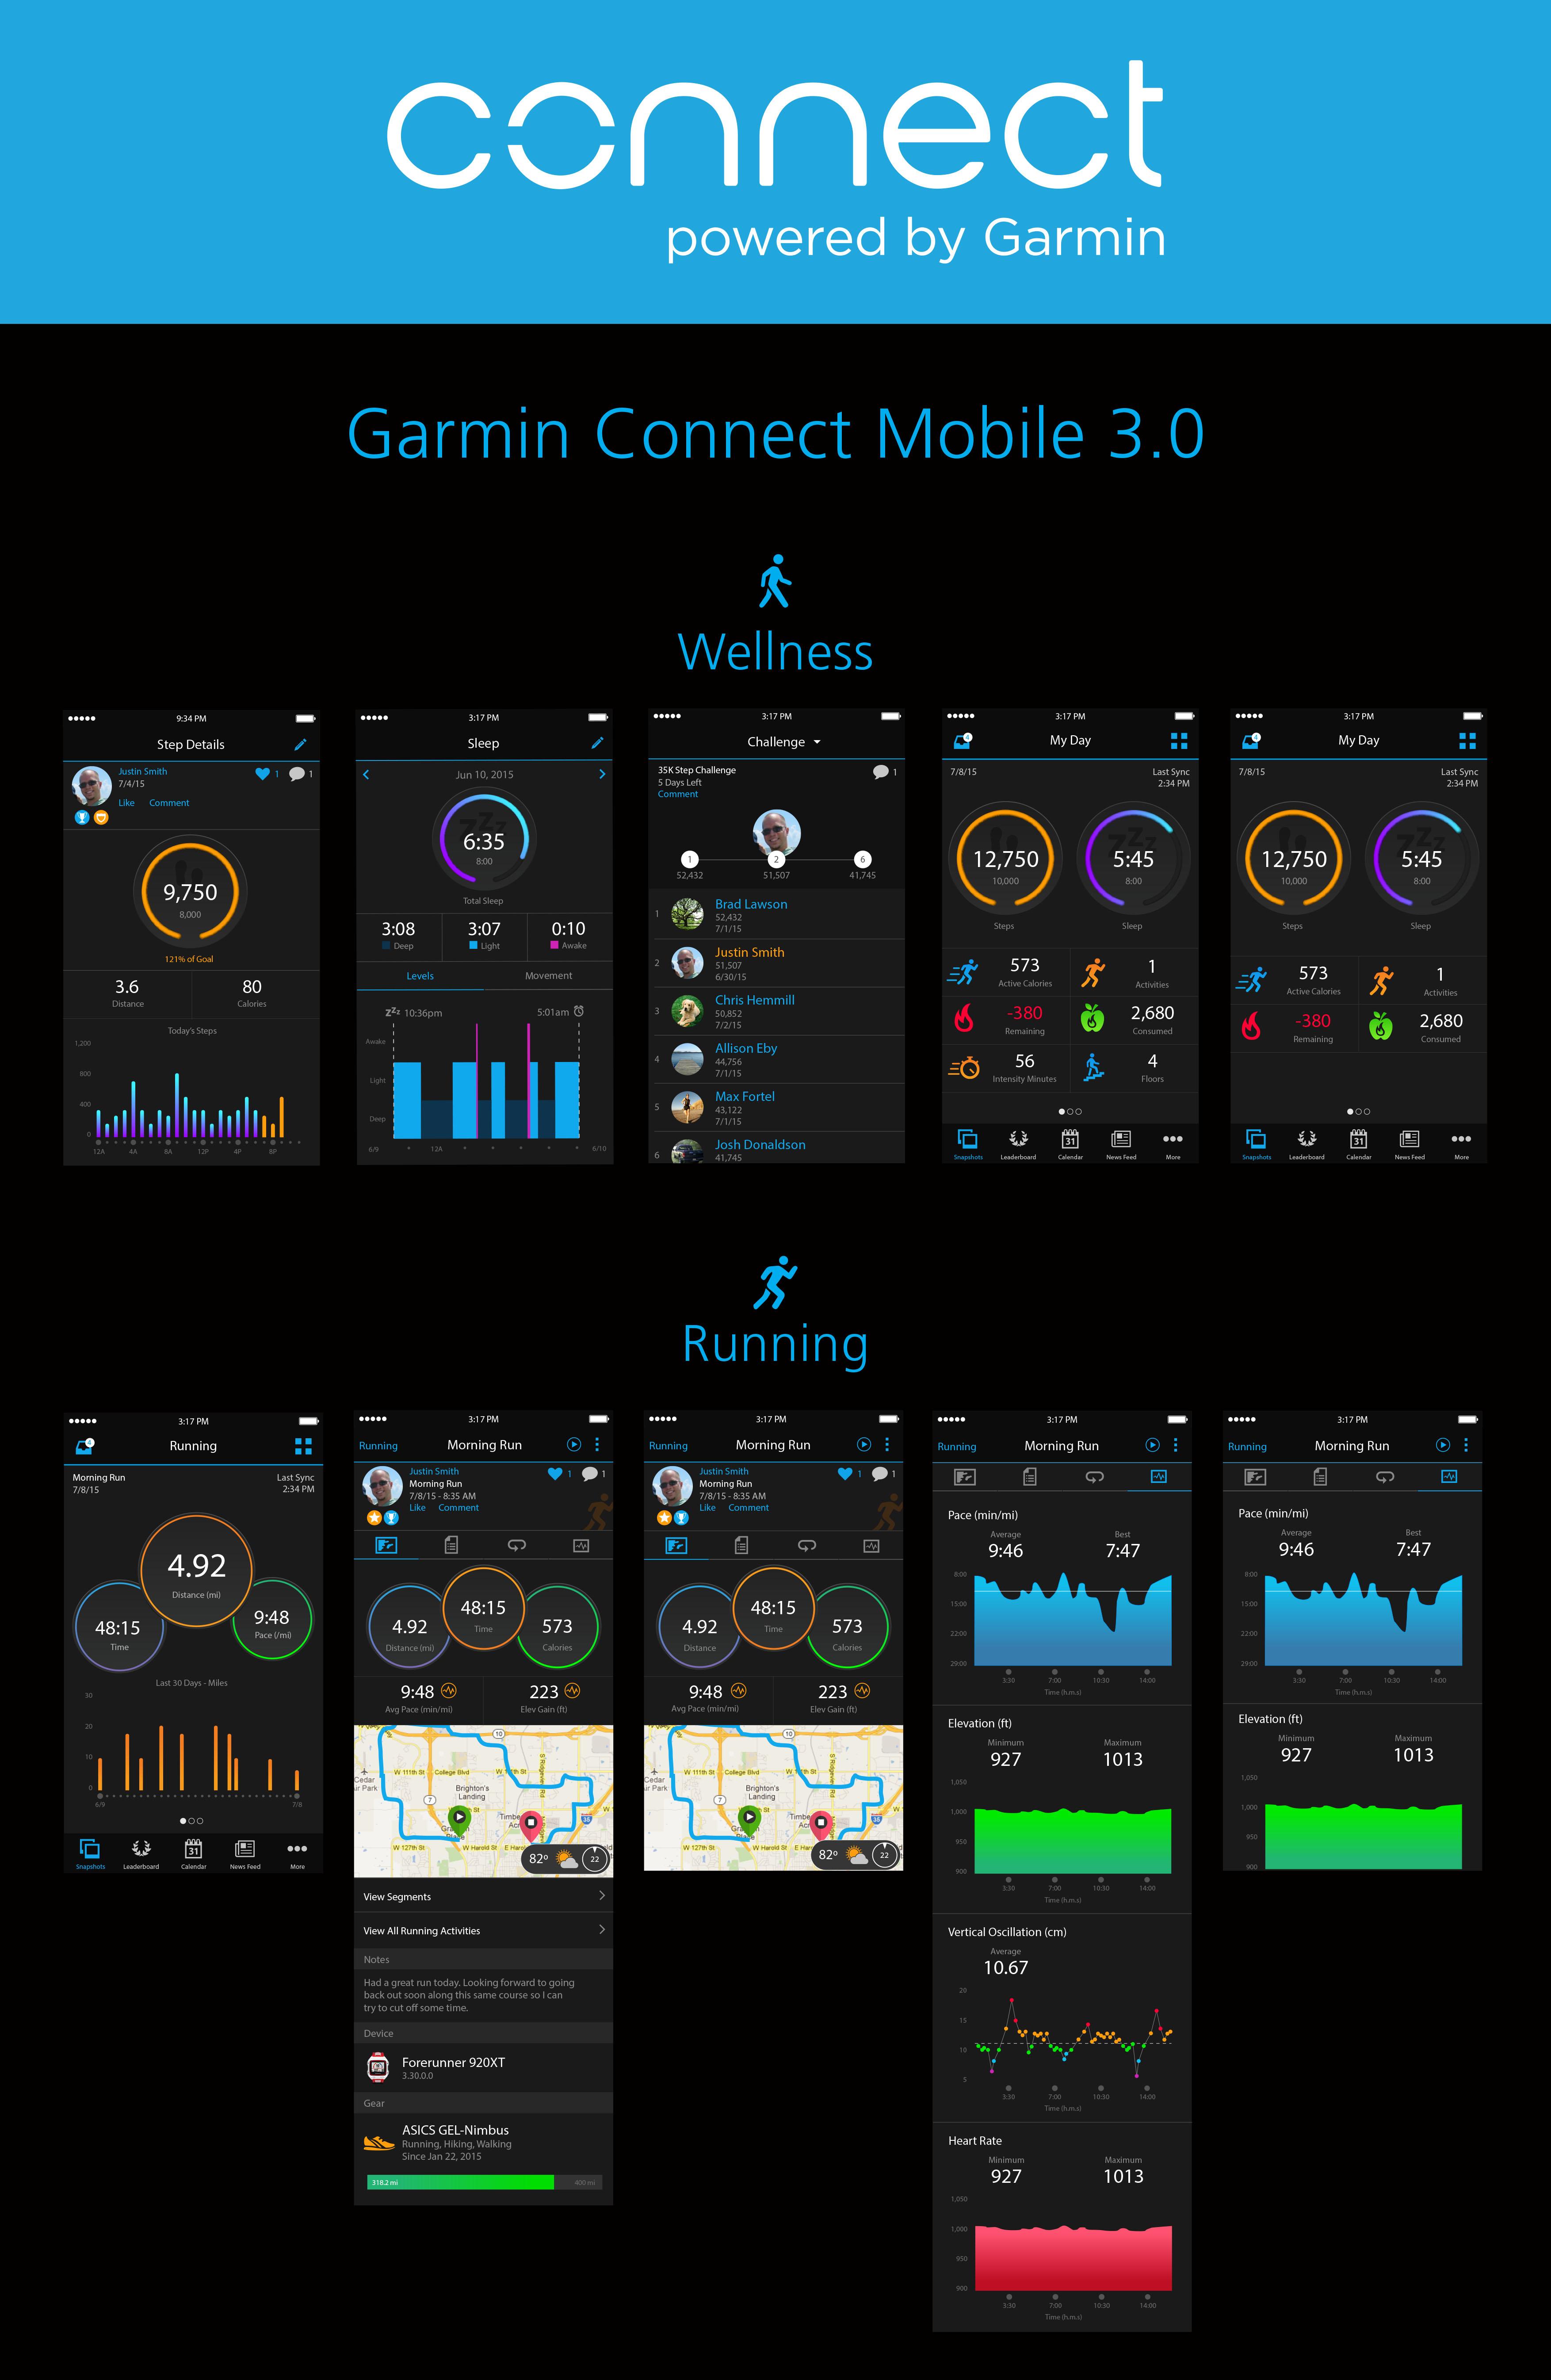 Garmin Launches Updated Connect Mobile Application 3 Input Xor Gate Logic Diagram 30 Screens Wellness Running